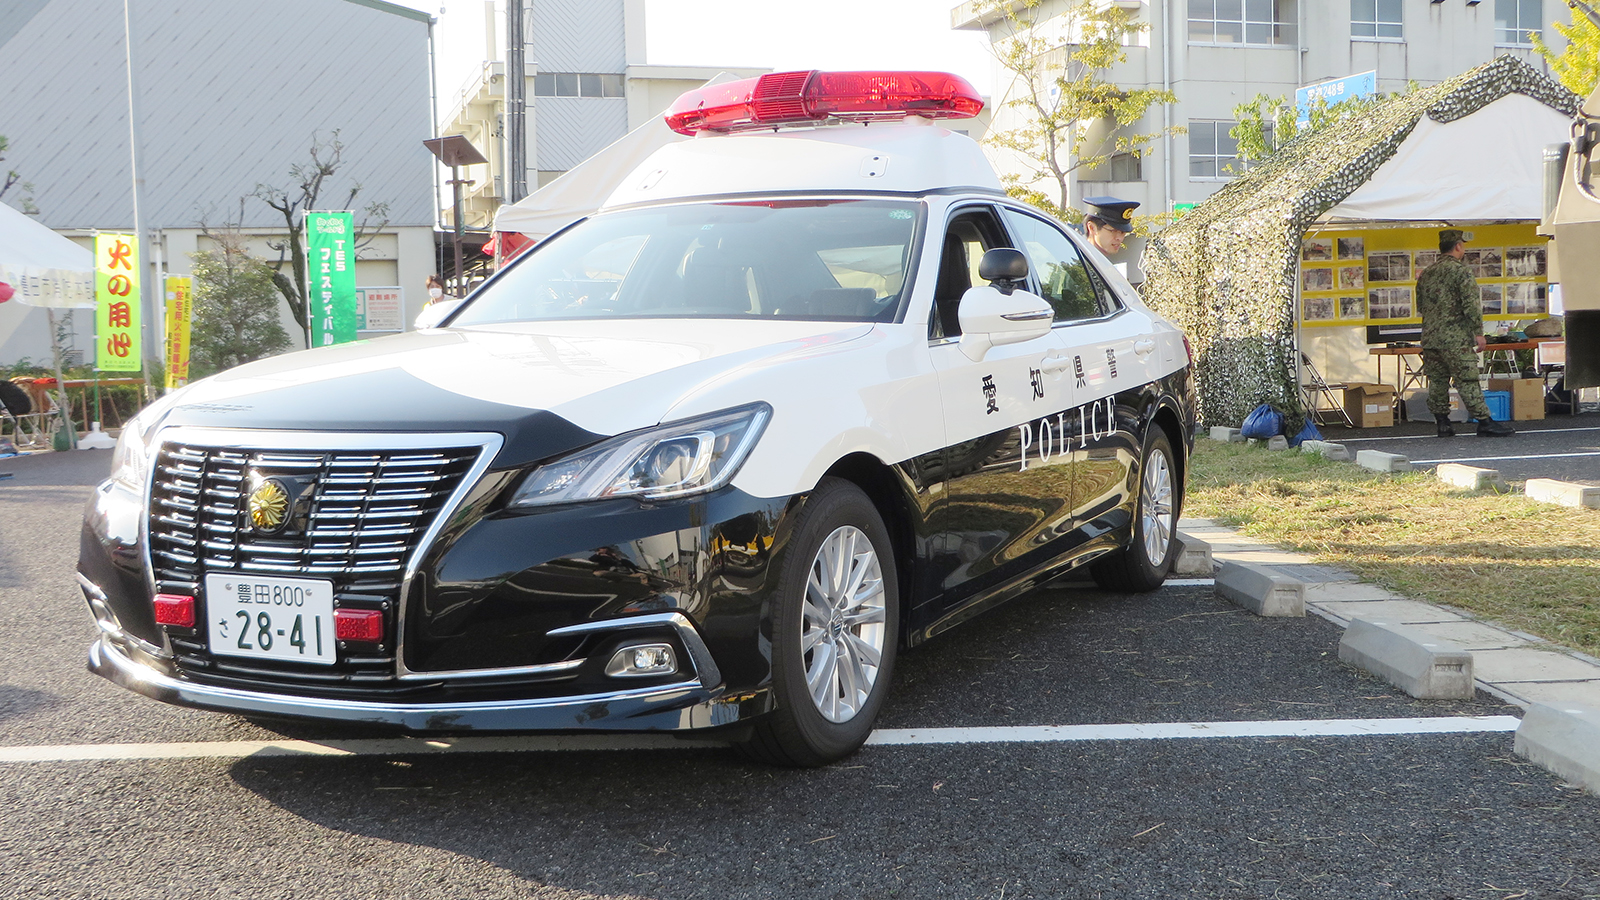 RX-7、GT-R、NSX…日本警车你还真惹不起!